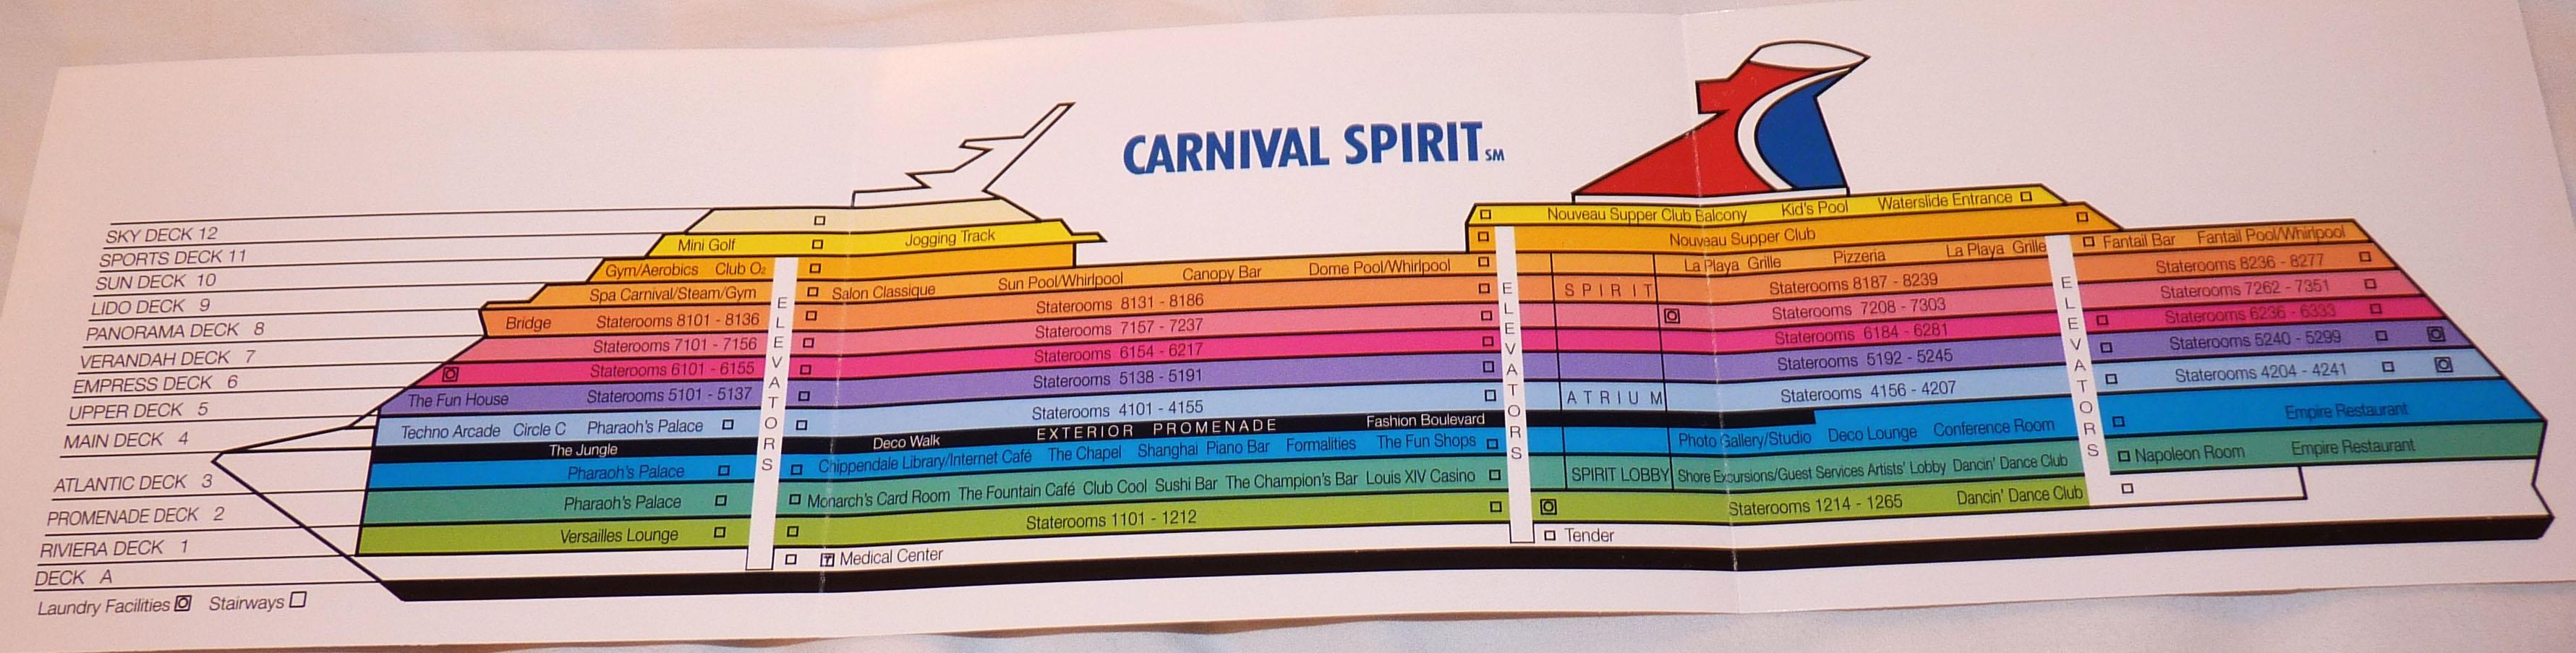 Carnival Splendor Deck Plans Pdf